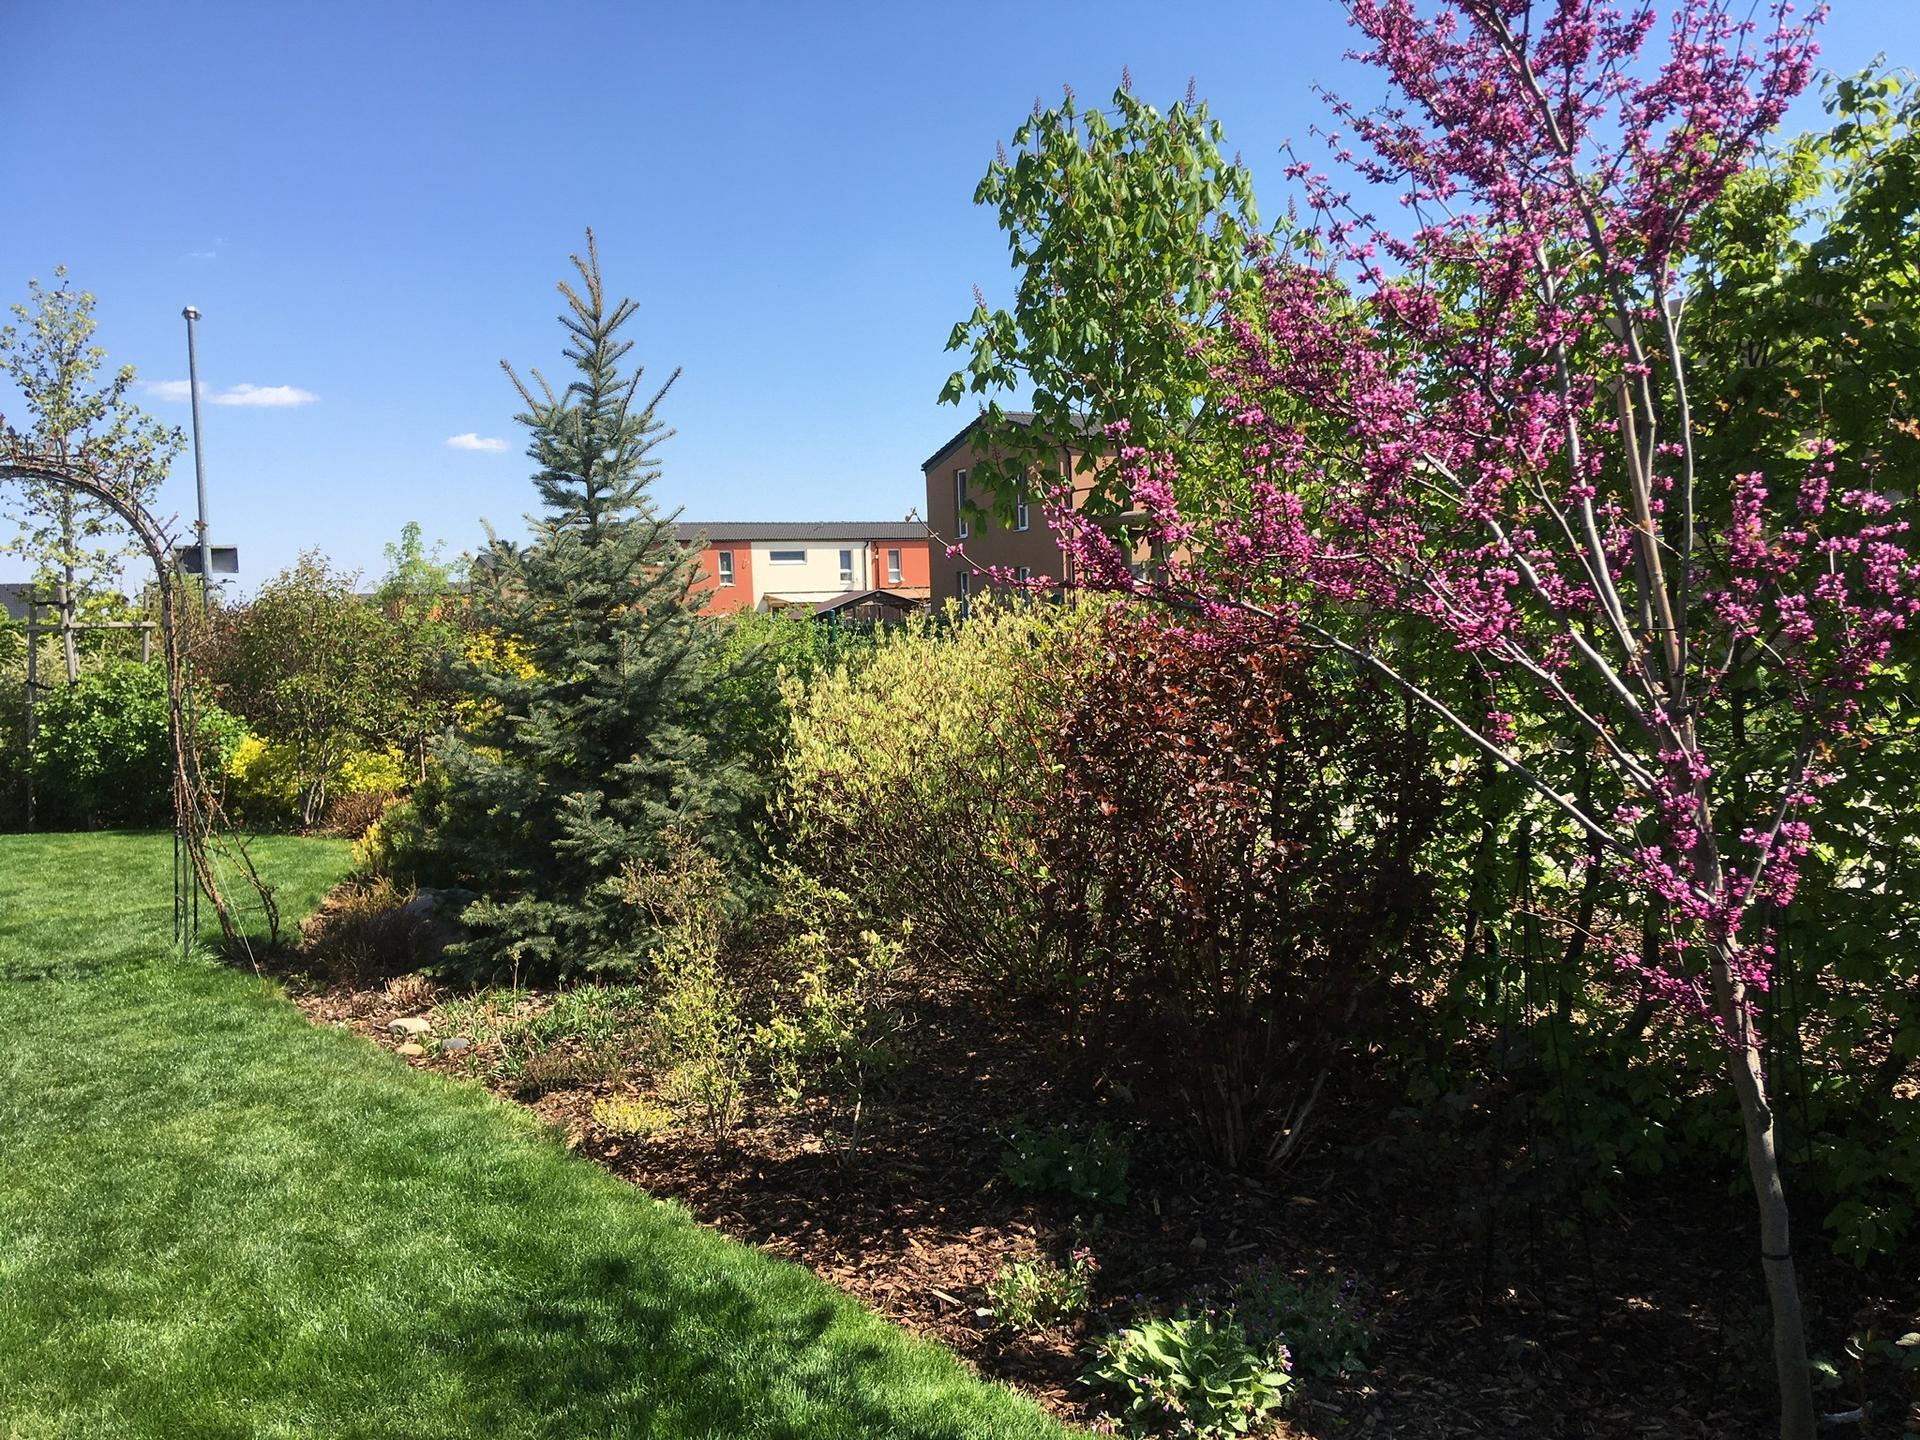 Zahrada 2020 - Obrázek č. 90